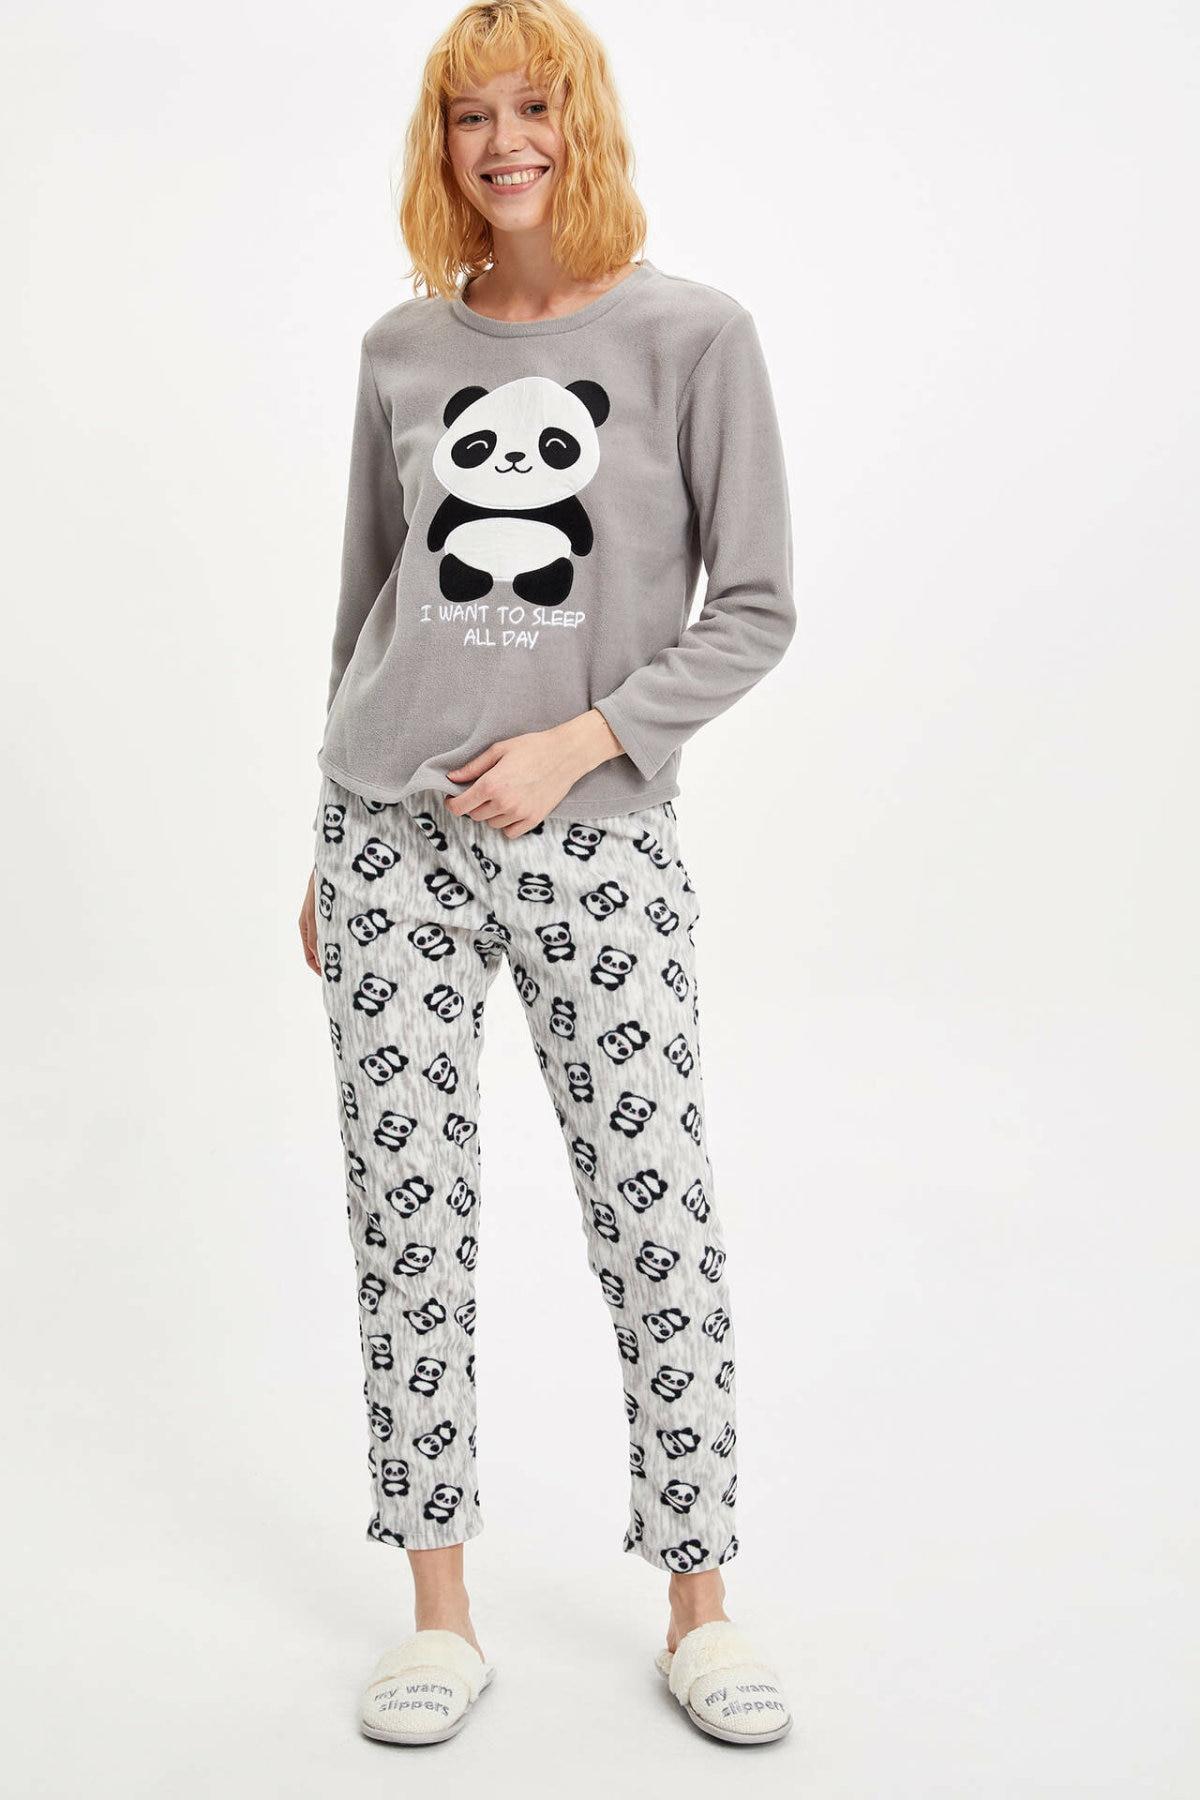 DeFacto Woman Lovely Panda Homewear Set Grey Color Animal Prints Women Knitted Pajamas Sets Women Tops Bottoms-M1874AZ19WN